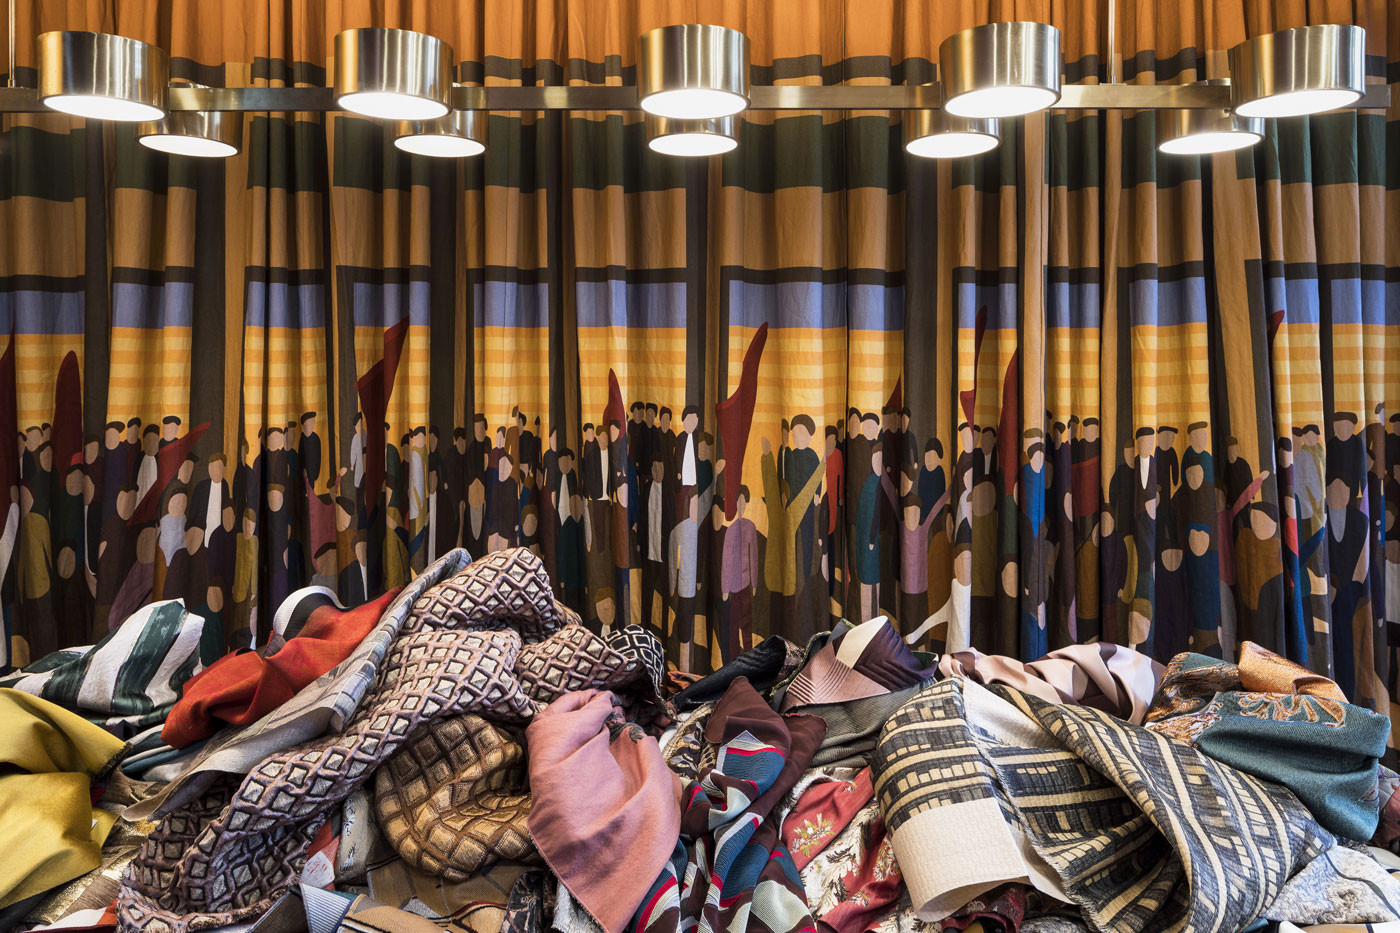 Dimorestudio progettotessuti paris Photo by Tadzio - dimoregallery - top italian interior designers - best interior designers in italy - italian furniture - luxury furniture - luxury interior design